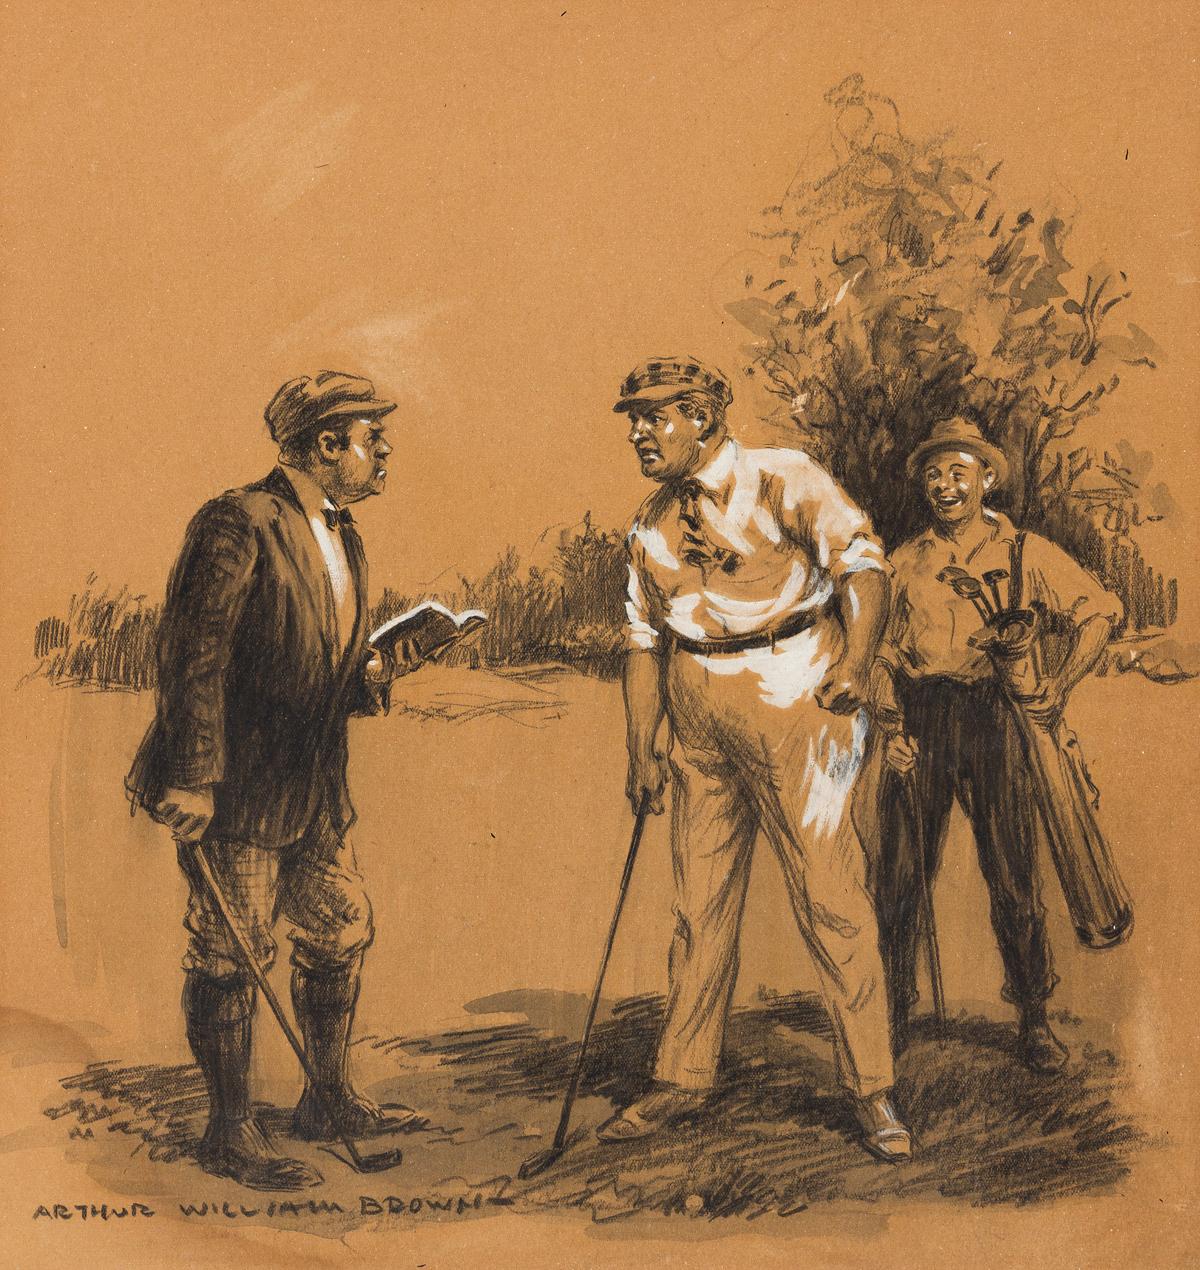 ARTHUR WILLIAM BROWN (1881-1966) Argument over Golf Rules. [GOLF]